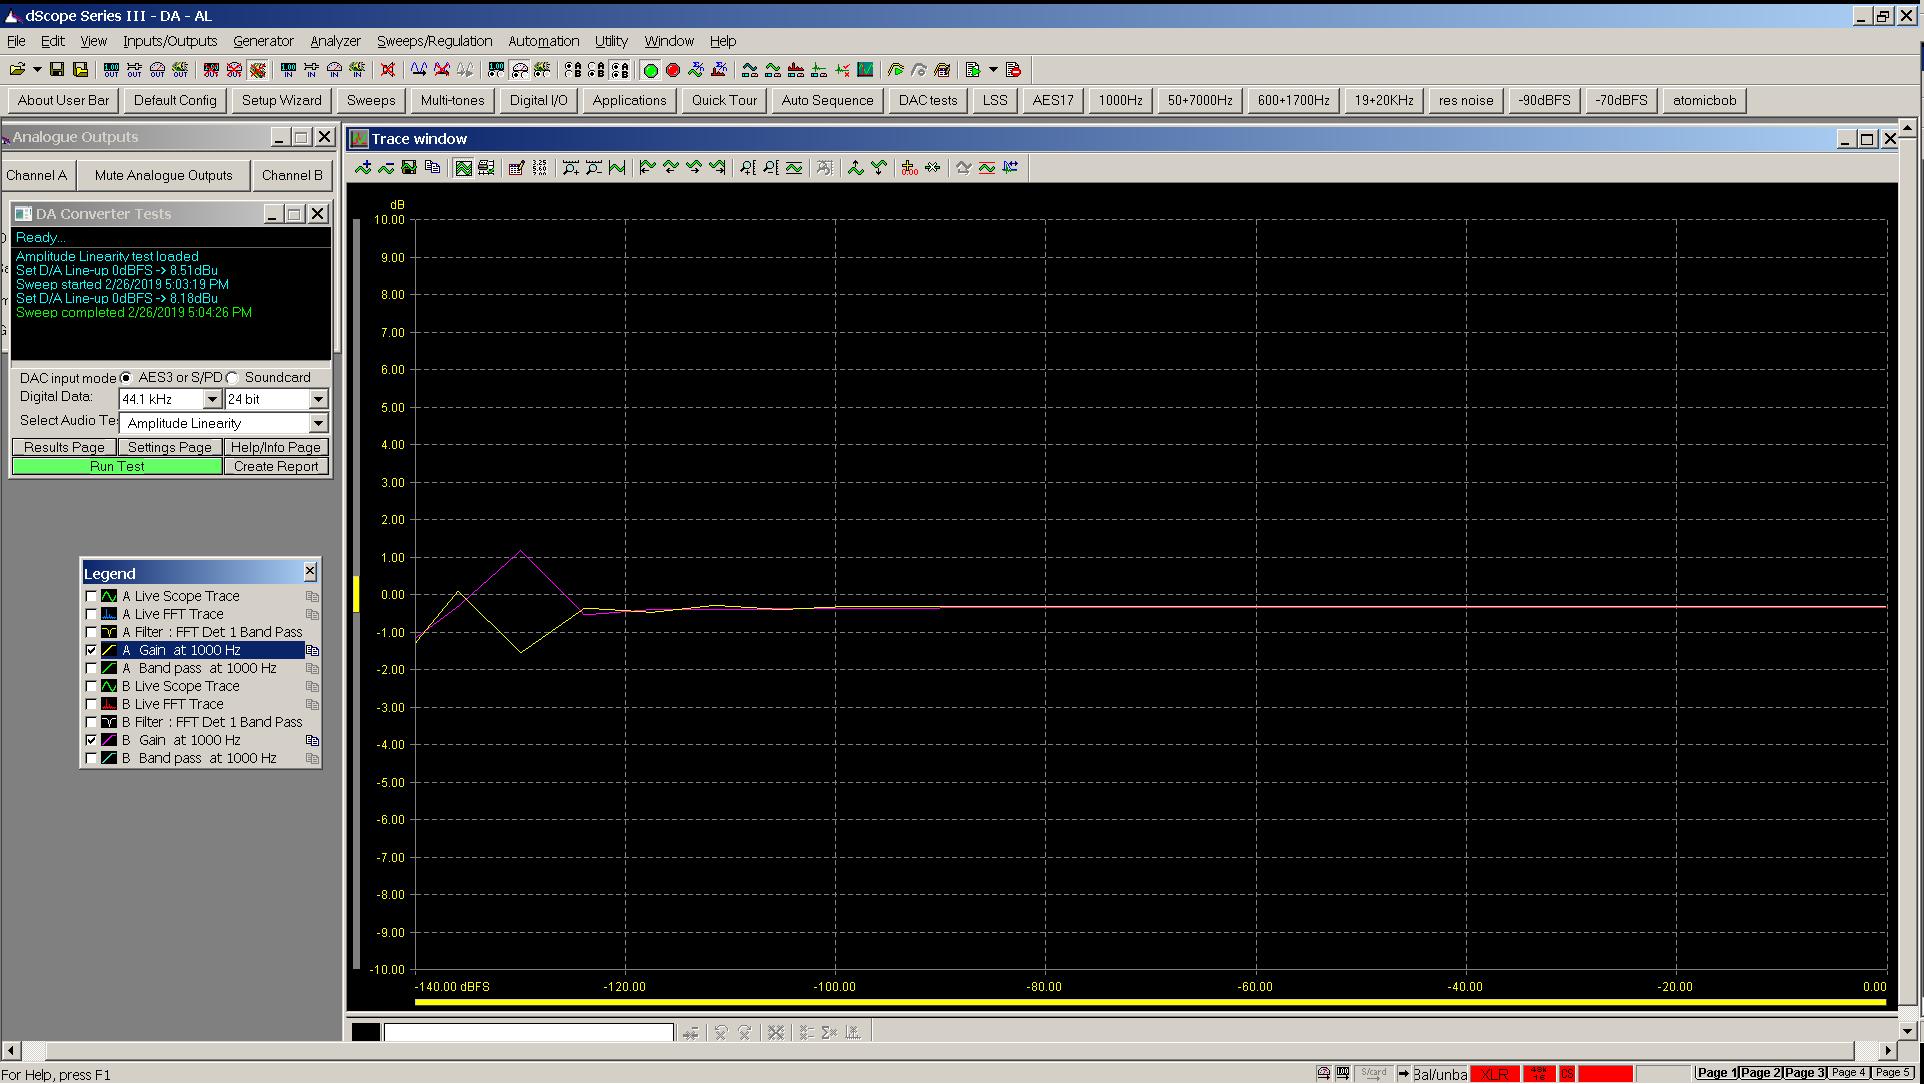 20190221 P20 1 KHz gain linearity 300R.PNG